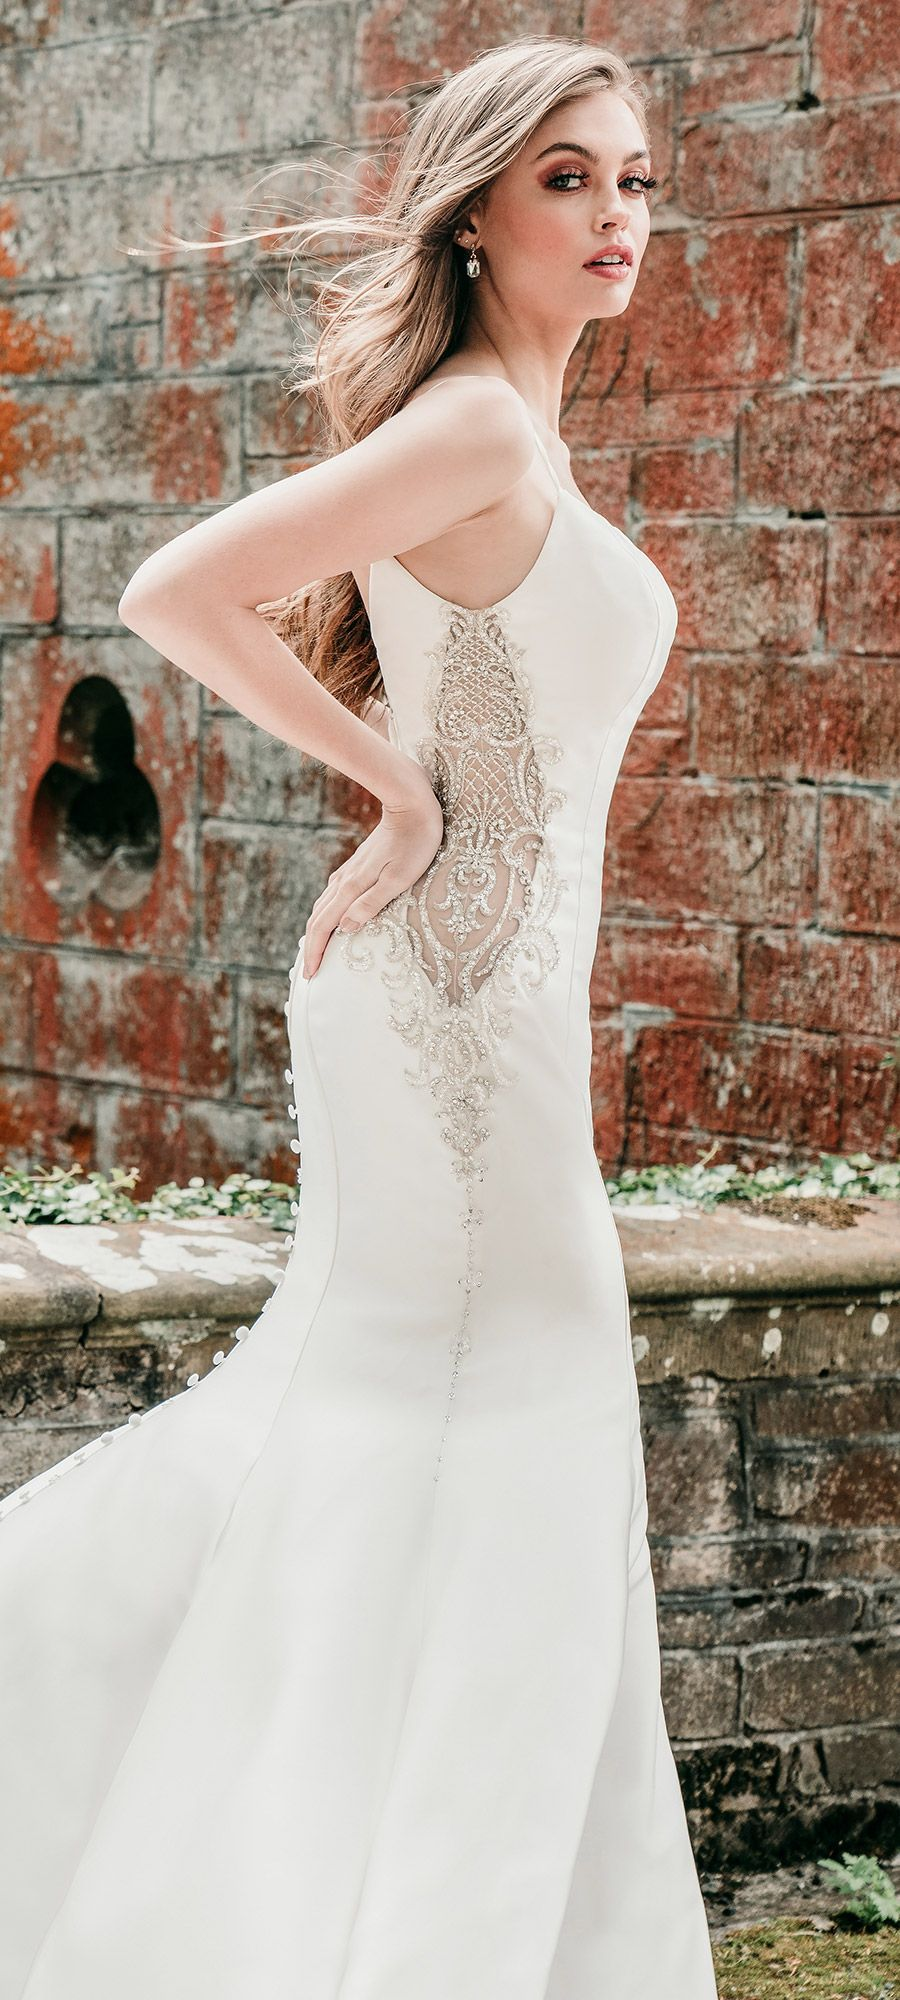 Allure Bridals Wedding Dress Style 9731 This Modern Mermaid Gown With Straps By Allurebrid Wedding Dresses Allure Bridal Wedding Dress Bridal Wedding Dresses [ 2000 x 900 Pixel ]